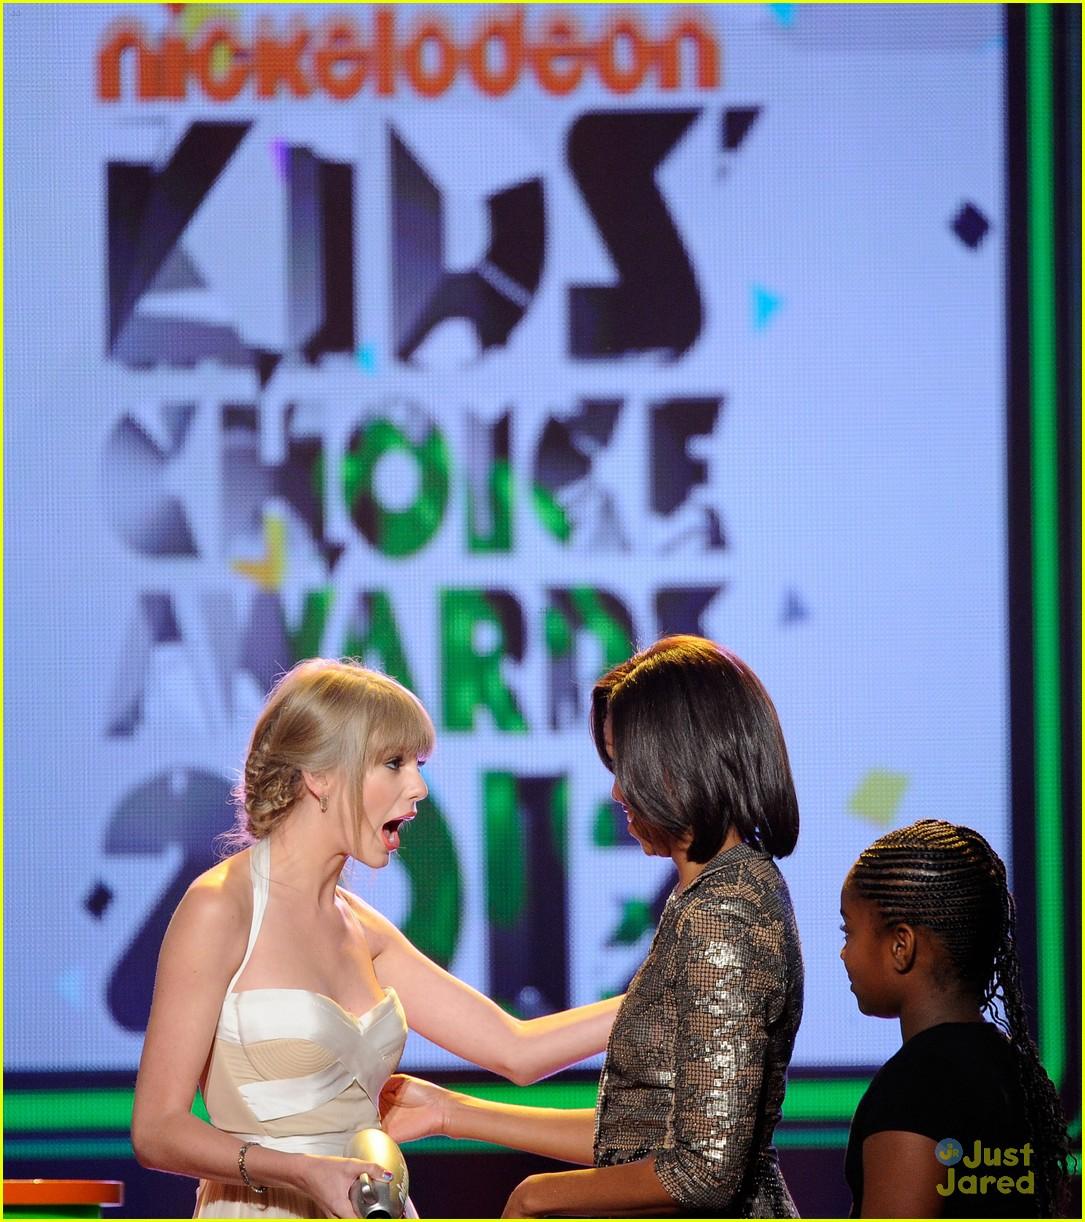 http://4.bp.blogspot.com/-lnzjw197D7w/T3kYoKajvmI/AAAAAAAAAII/kGuO5pQBWvY/s1600/taylor-swift-kids-choice-awards-10.jpg